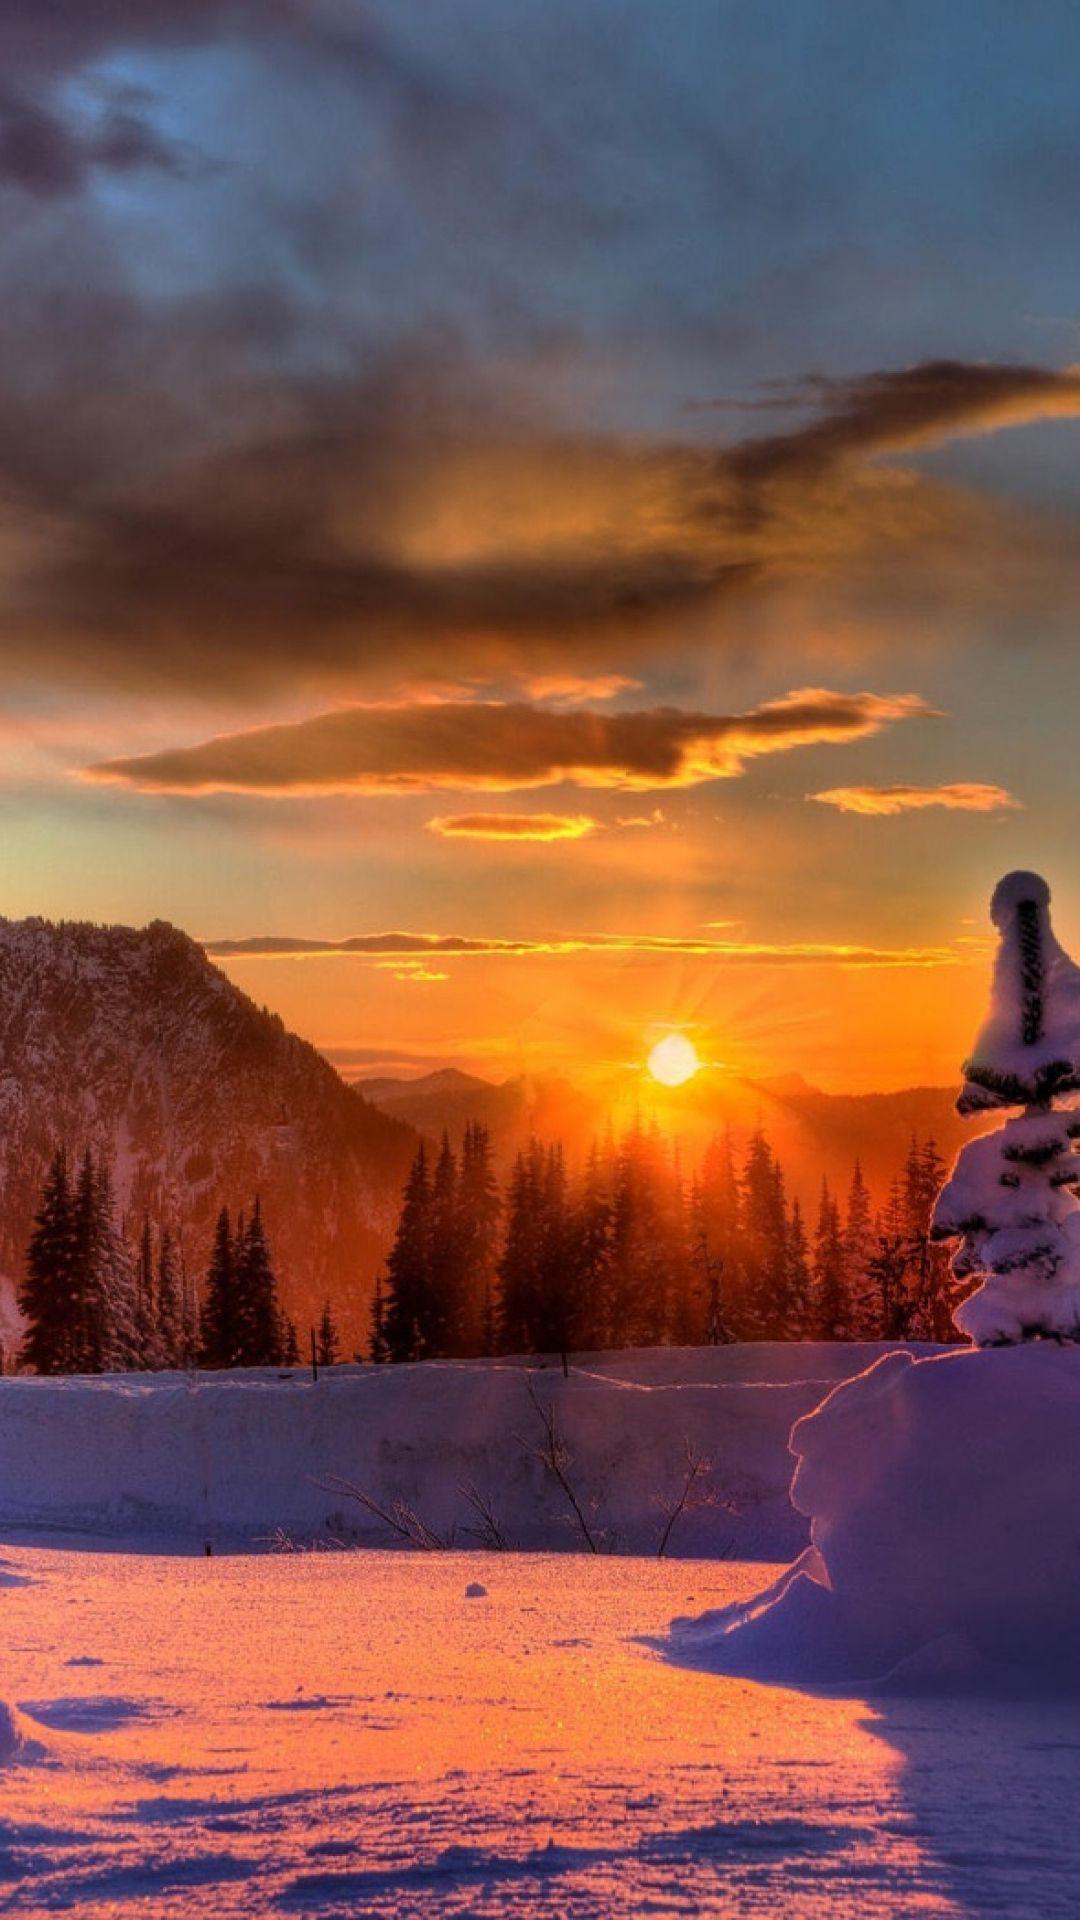 sun, mountains, clouds, snowdrifts, fur-trees, winter